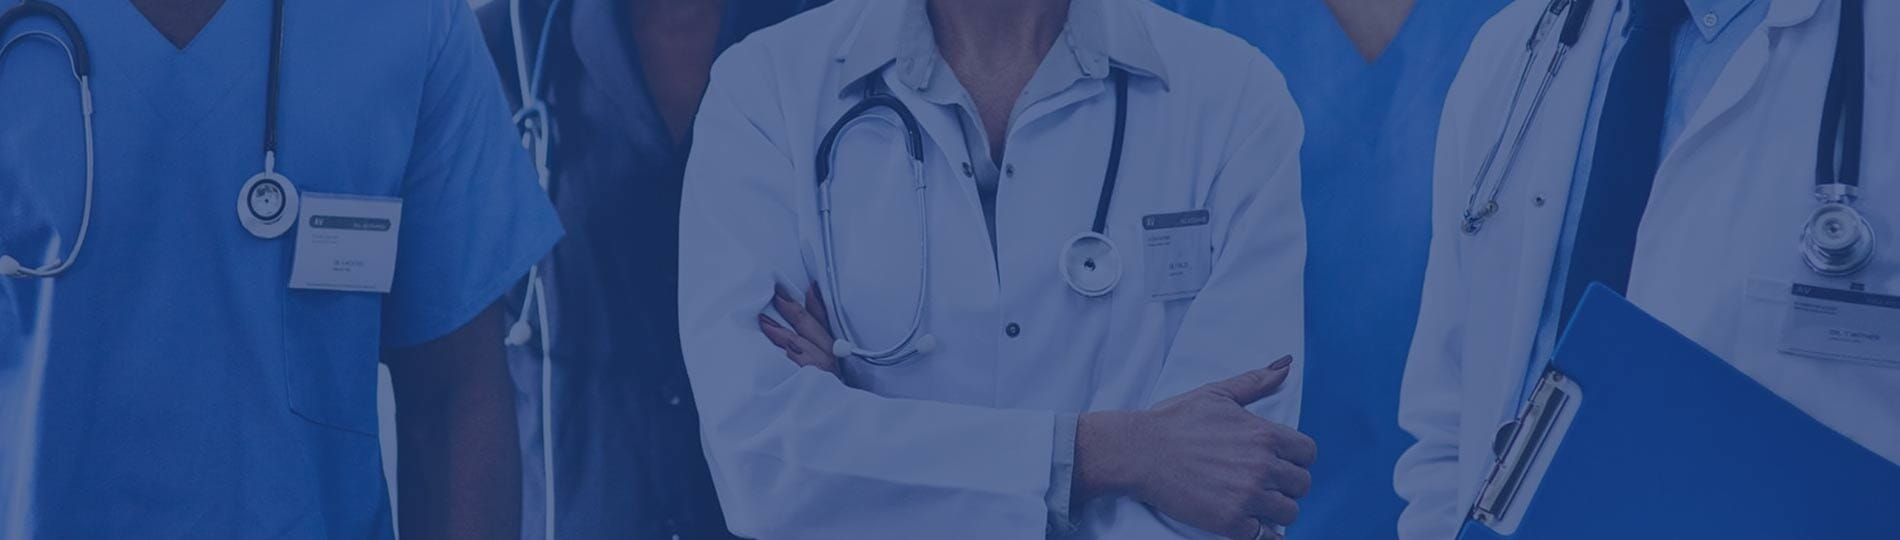 Healthcare Background Screening